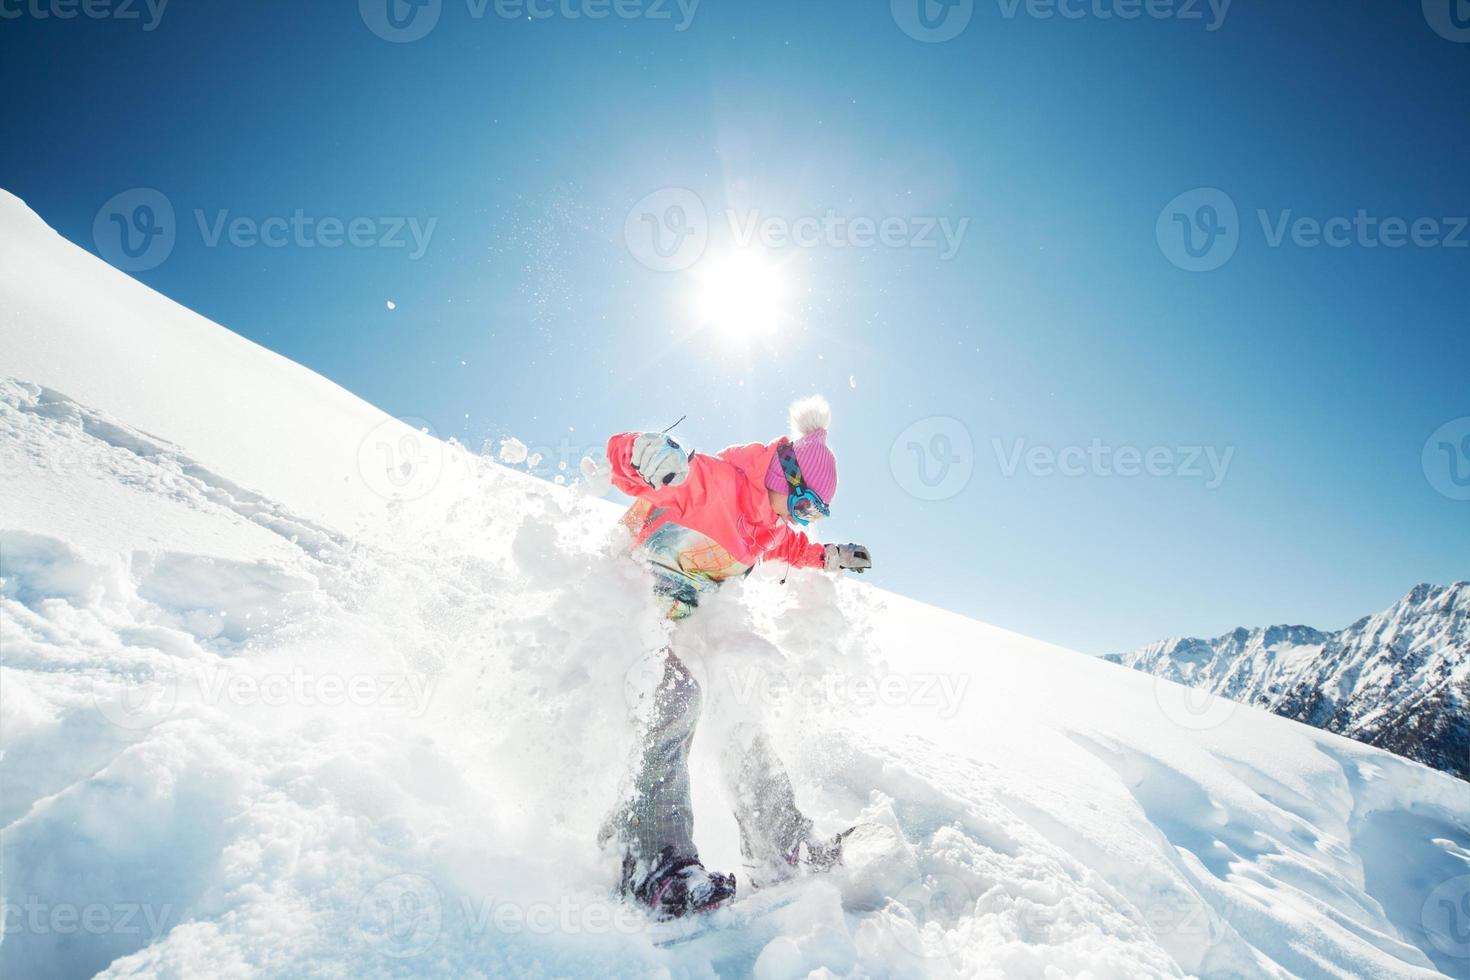 Winterspaß foto